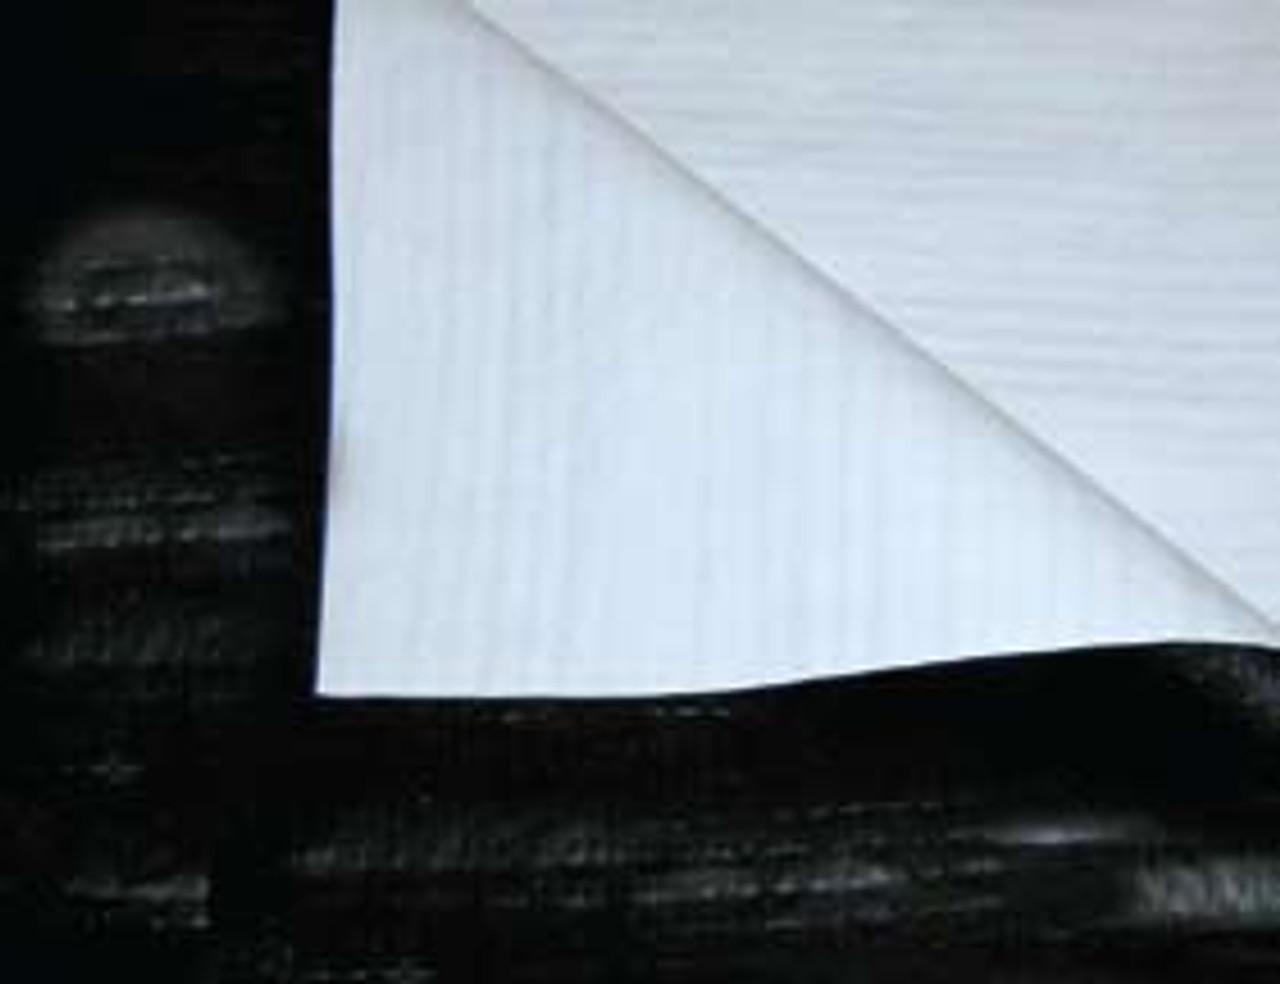 14 MIL Polyethylene Landfill Covers, Style A